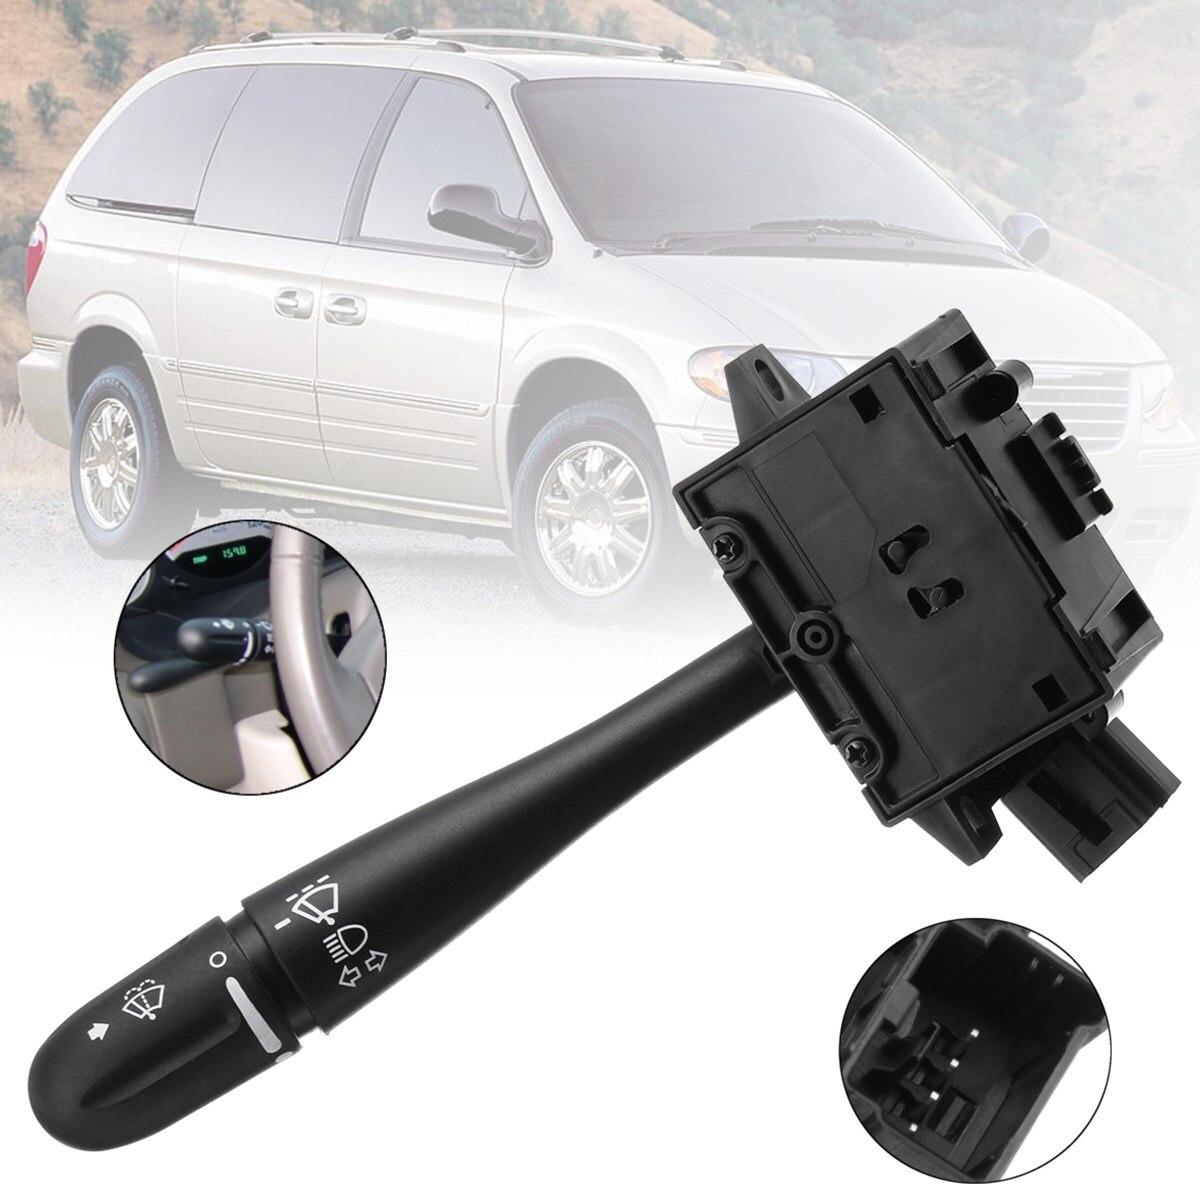 Steering Column Turn Signal Headlamp Switch Wiper Blade Unit For Dodge Grand Caravan Chrysler Voyager 2003 2004 2005 2006 2007 dacute пальто